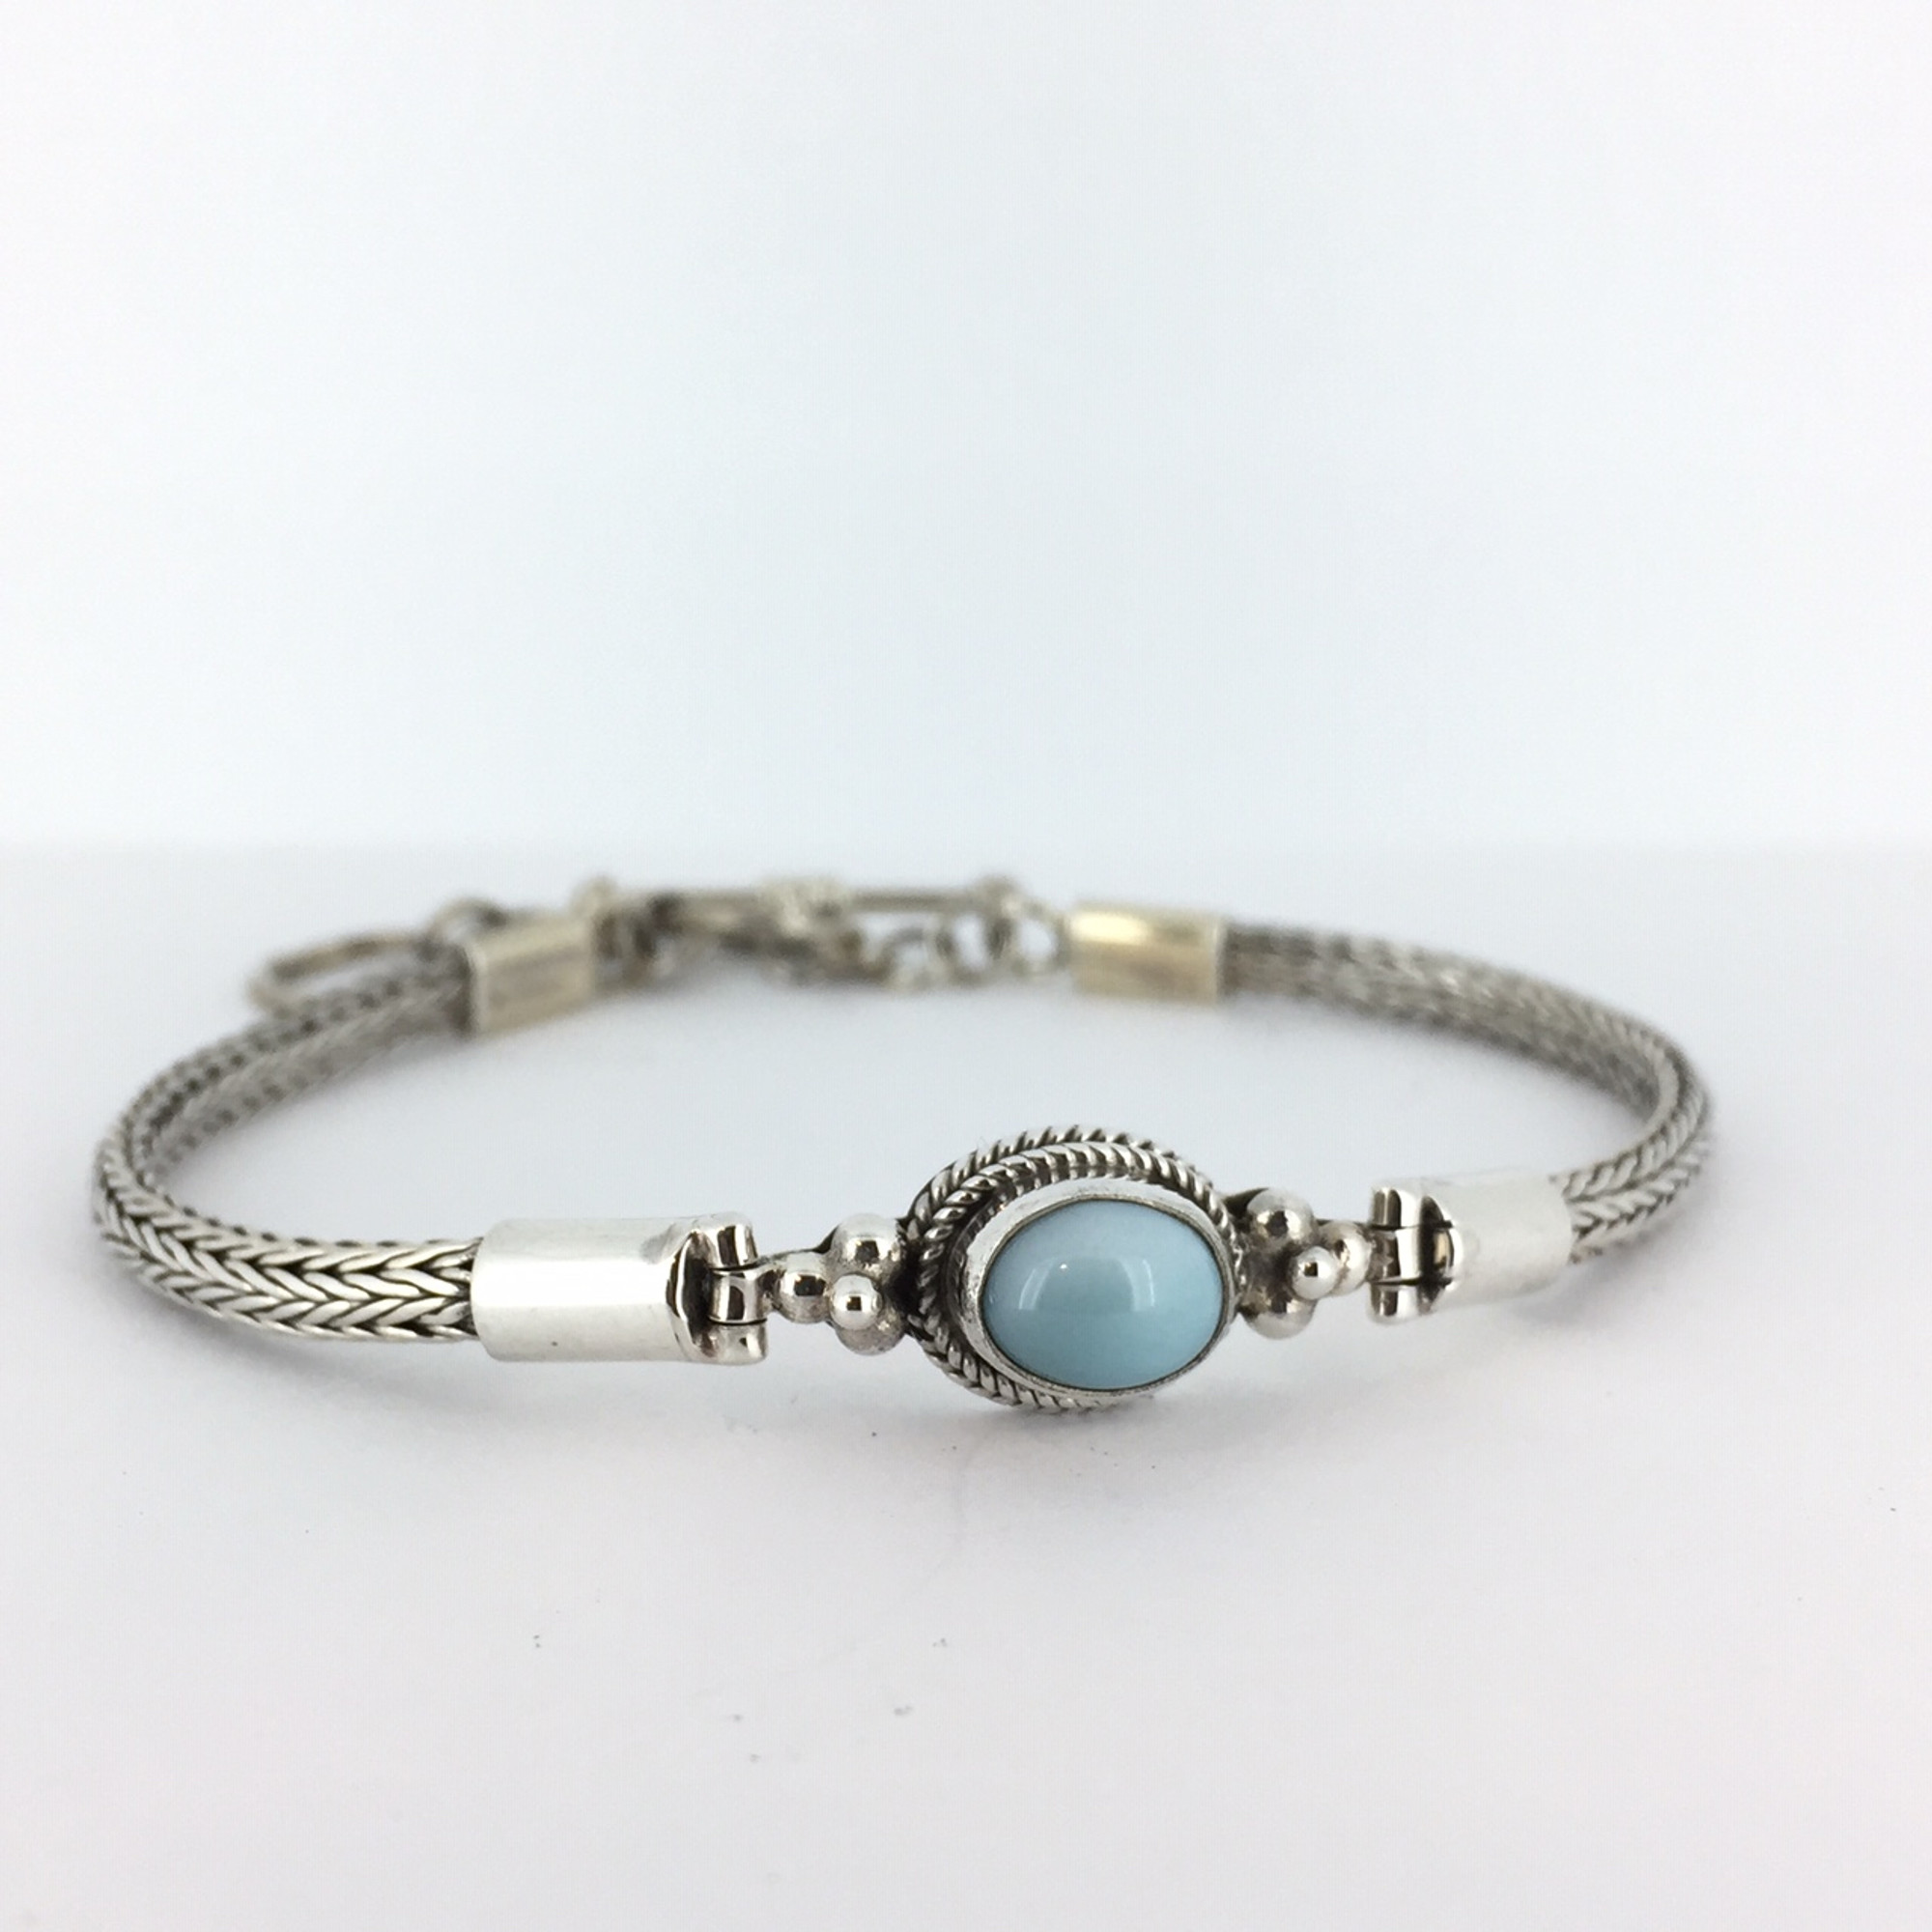 65663862b Larimar Sterling Silver Bali Toggle Bracelet - Mima's Of Warwick, LLC